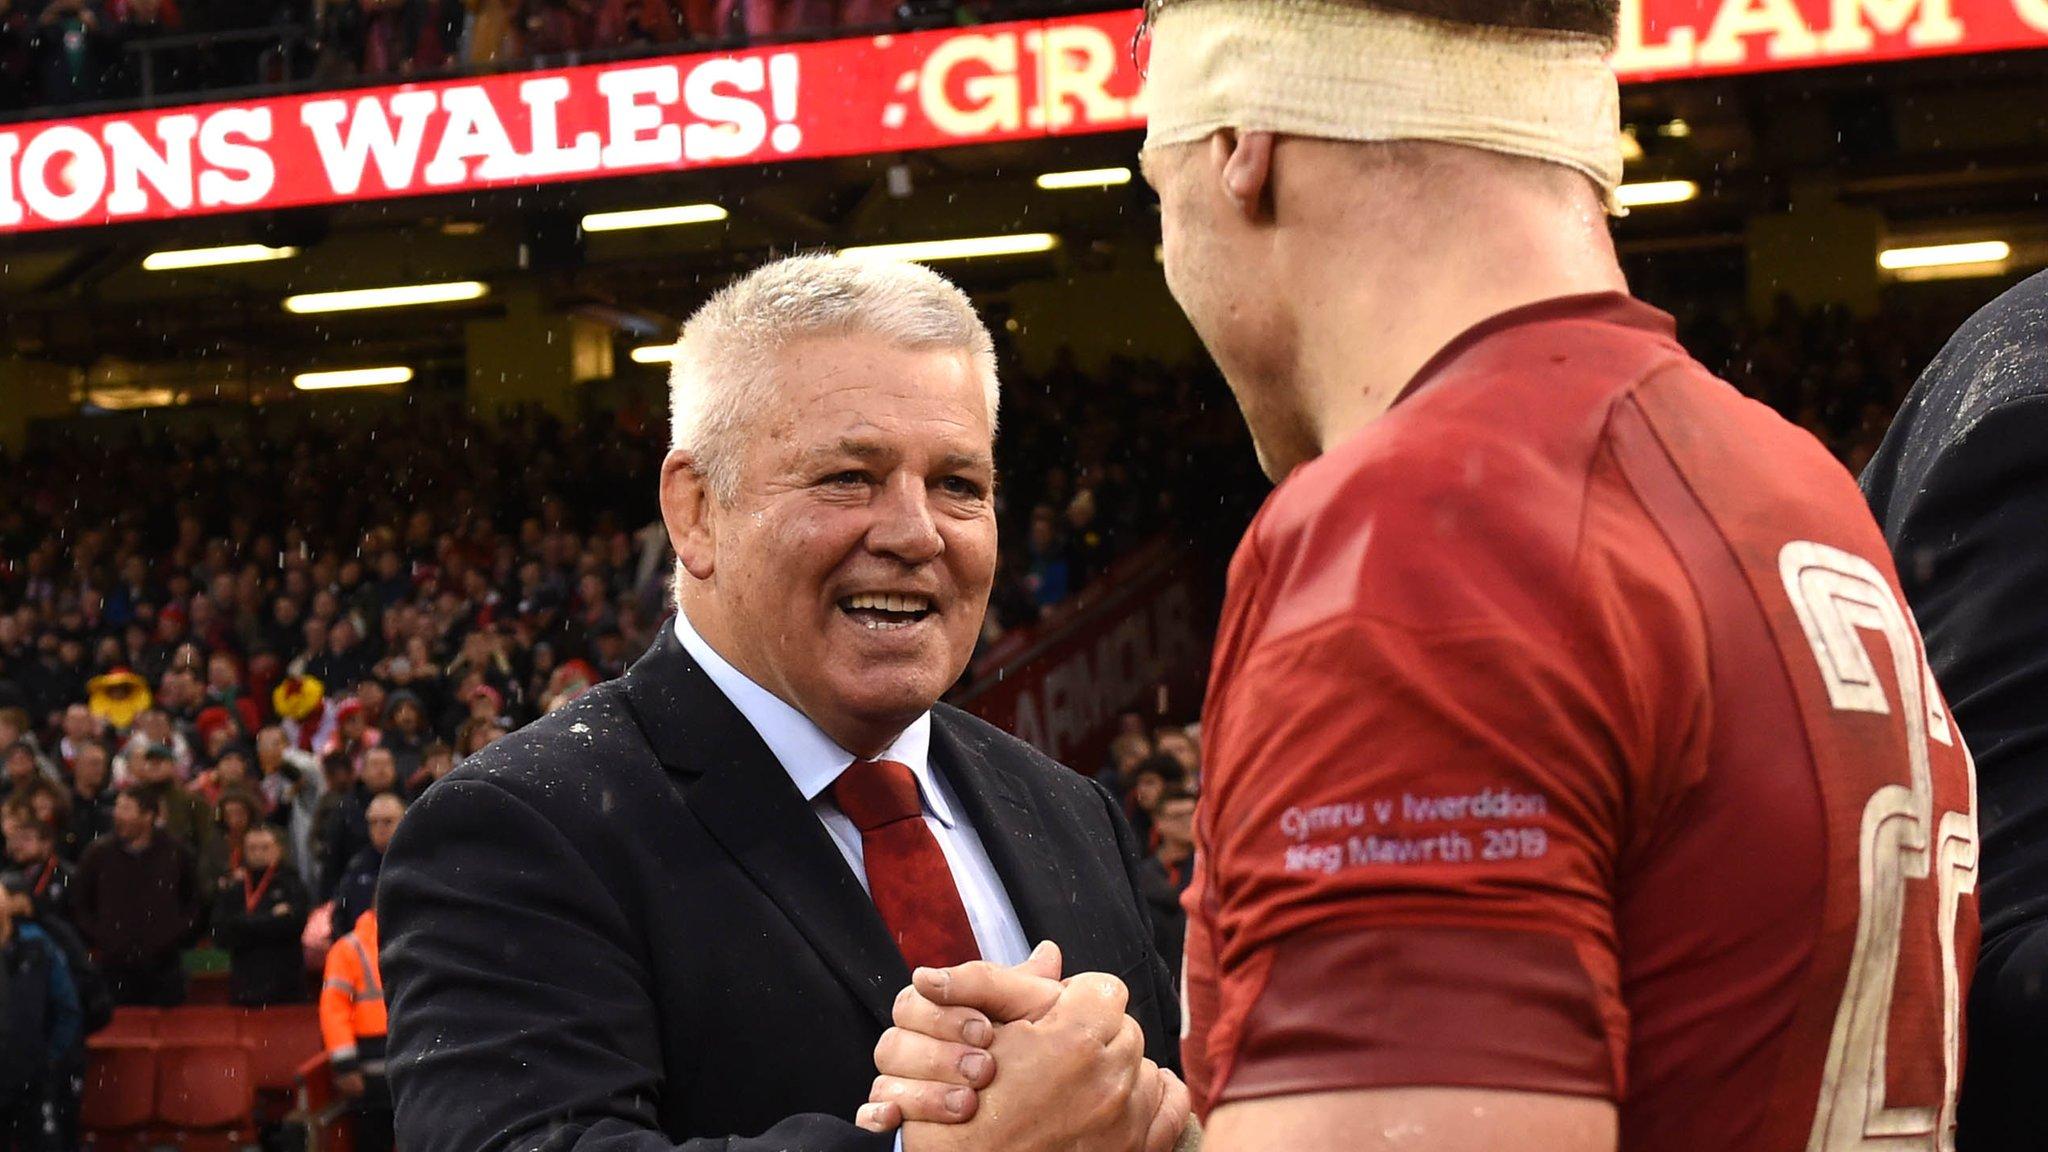 Dan Biggar: Wales 10 would not begrudge Warren Gatland taking England job